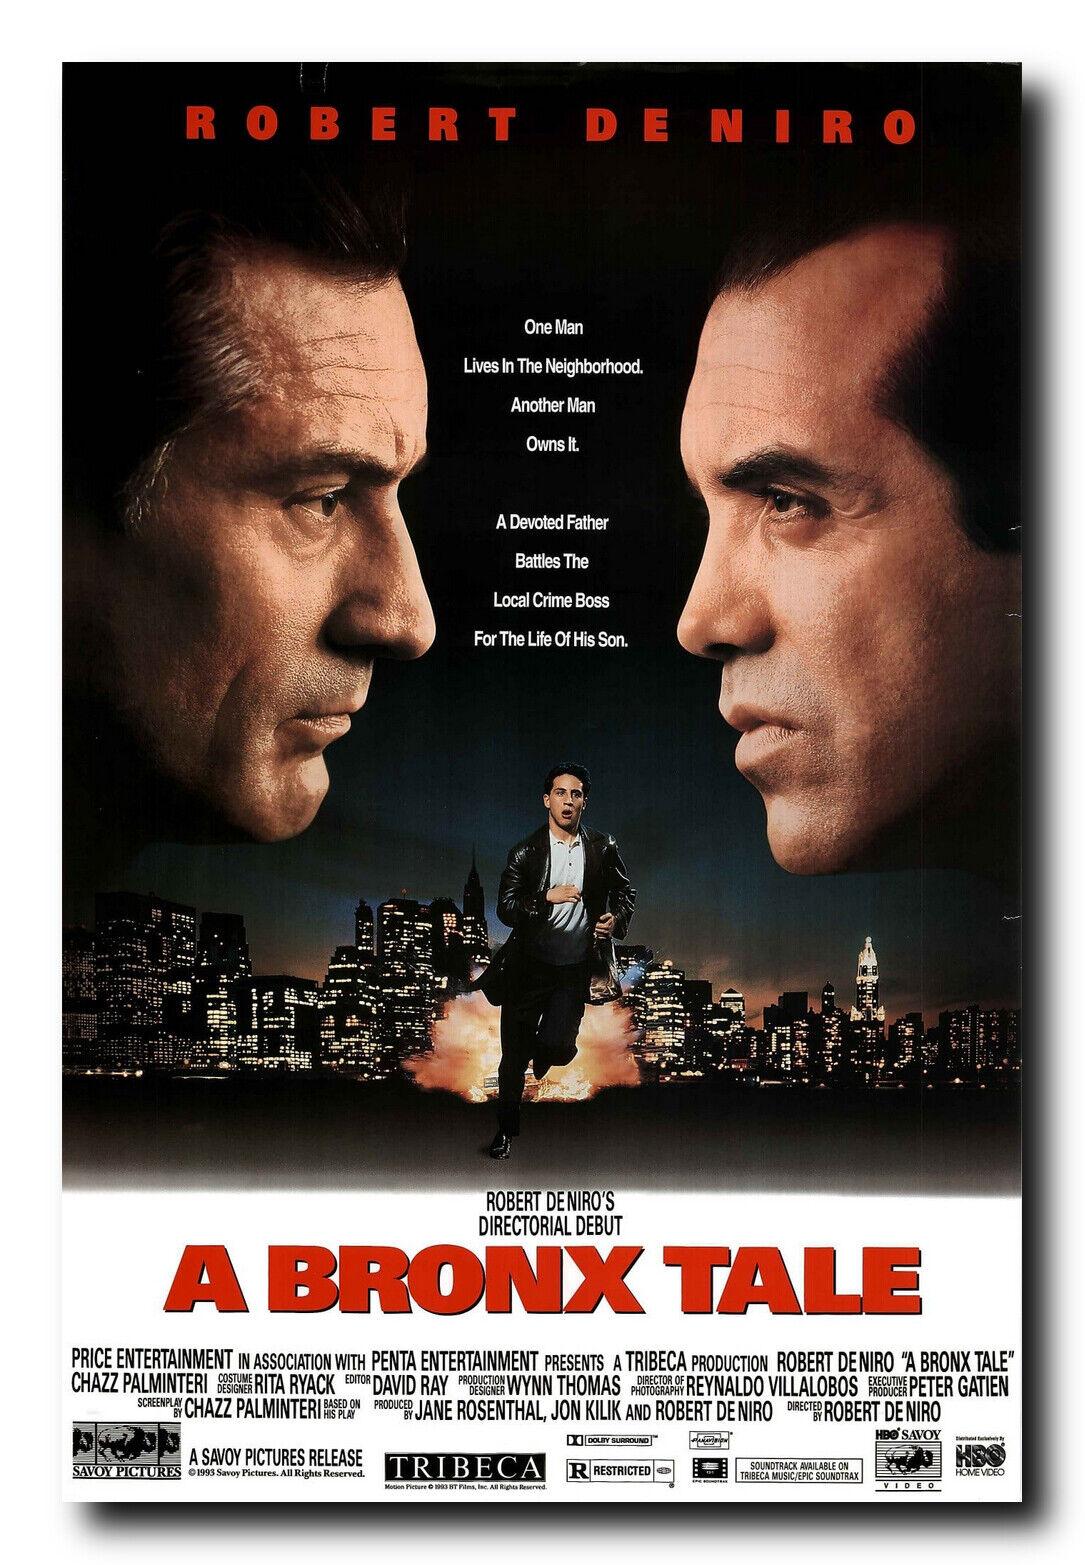 A Bronx Tale Movie Poster 24x36 Inch Wall Art Portrait Print